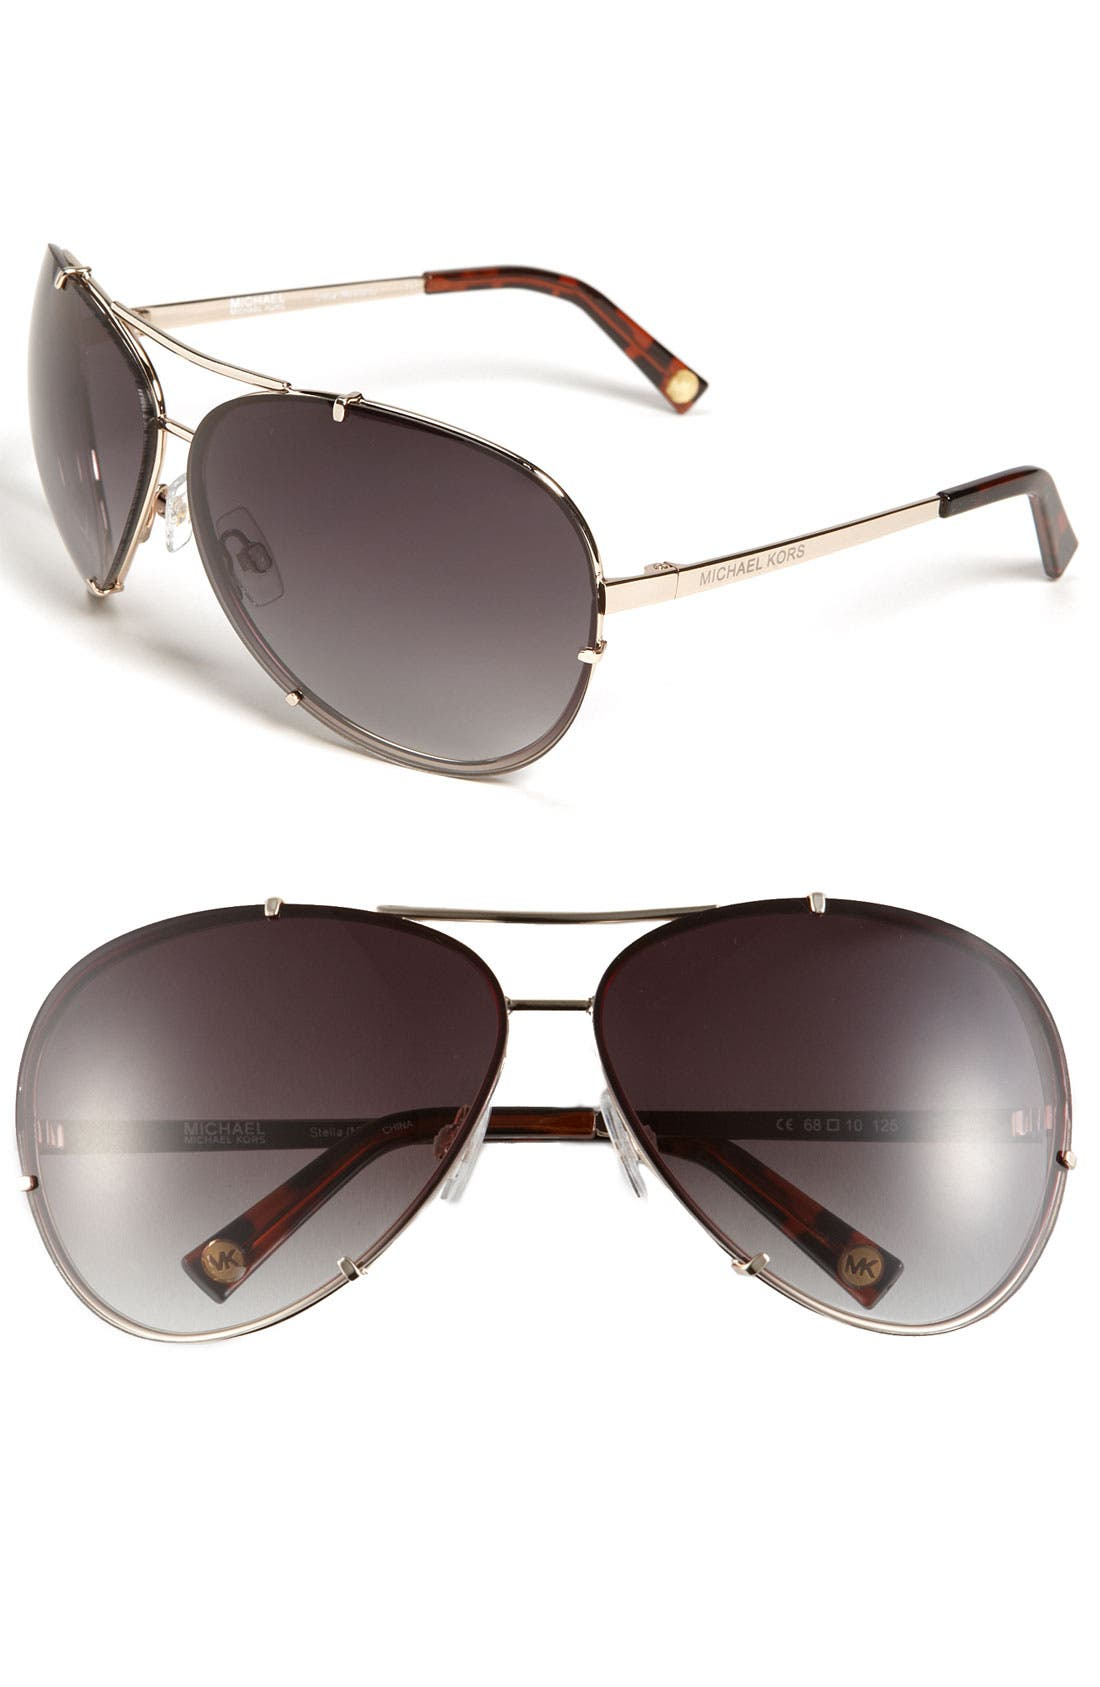 Alternate Image 1 Selected - MICHAEL Michael Kors 'Stella' 68mm Aviator Sunglasses